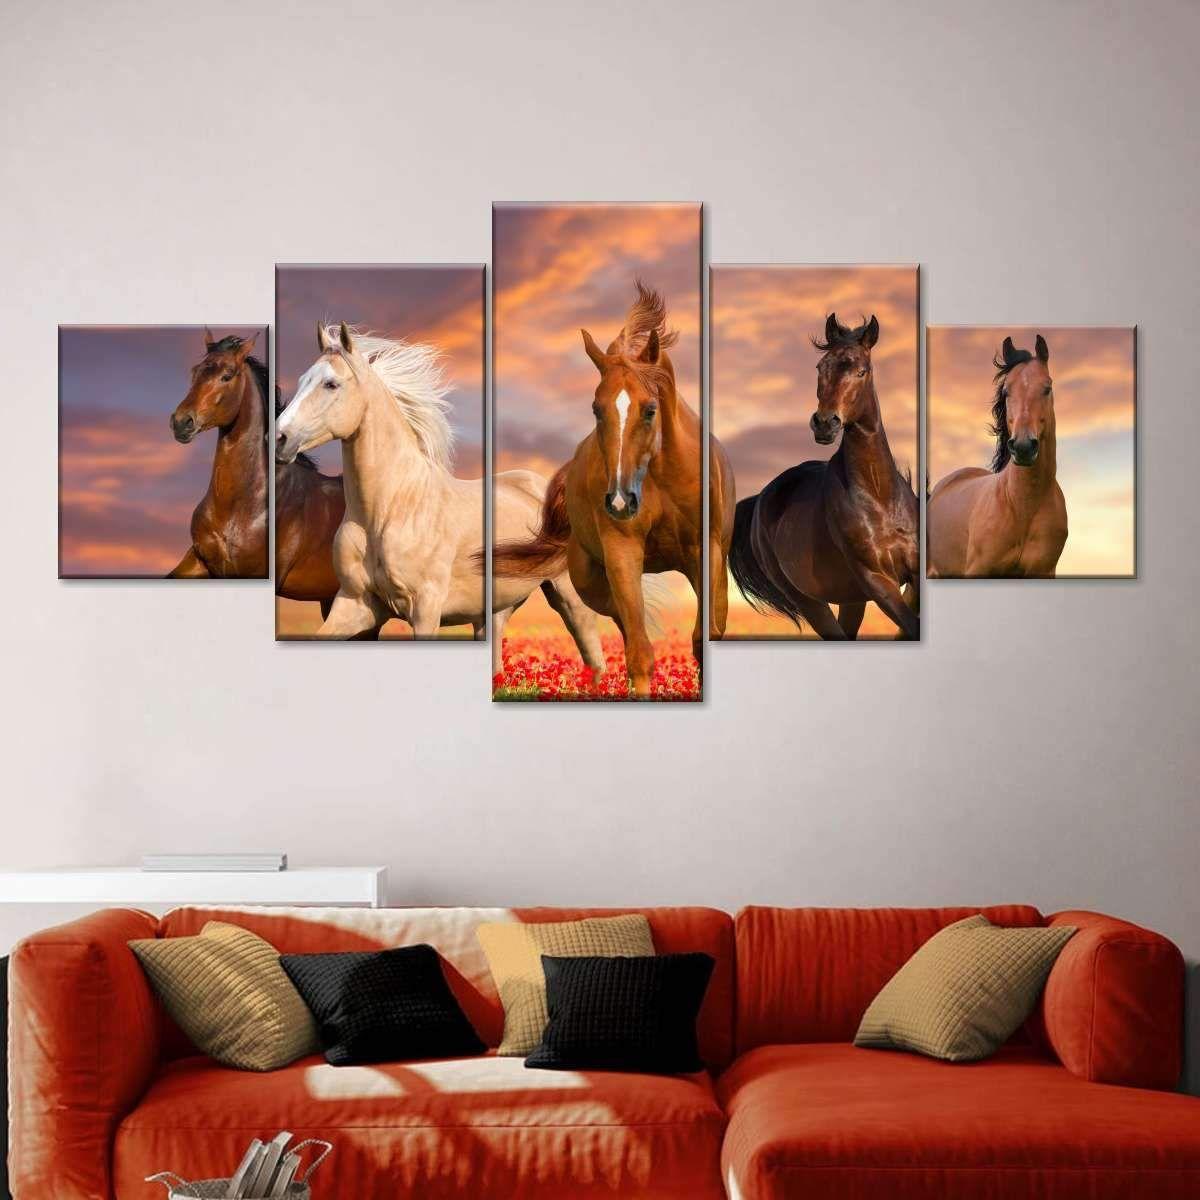 Mustang Horses Wall Art Horse Wall Art Horse Wall Horse Canvas Painting